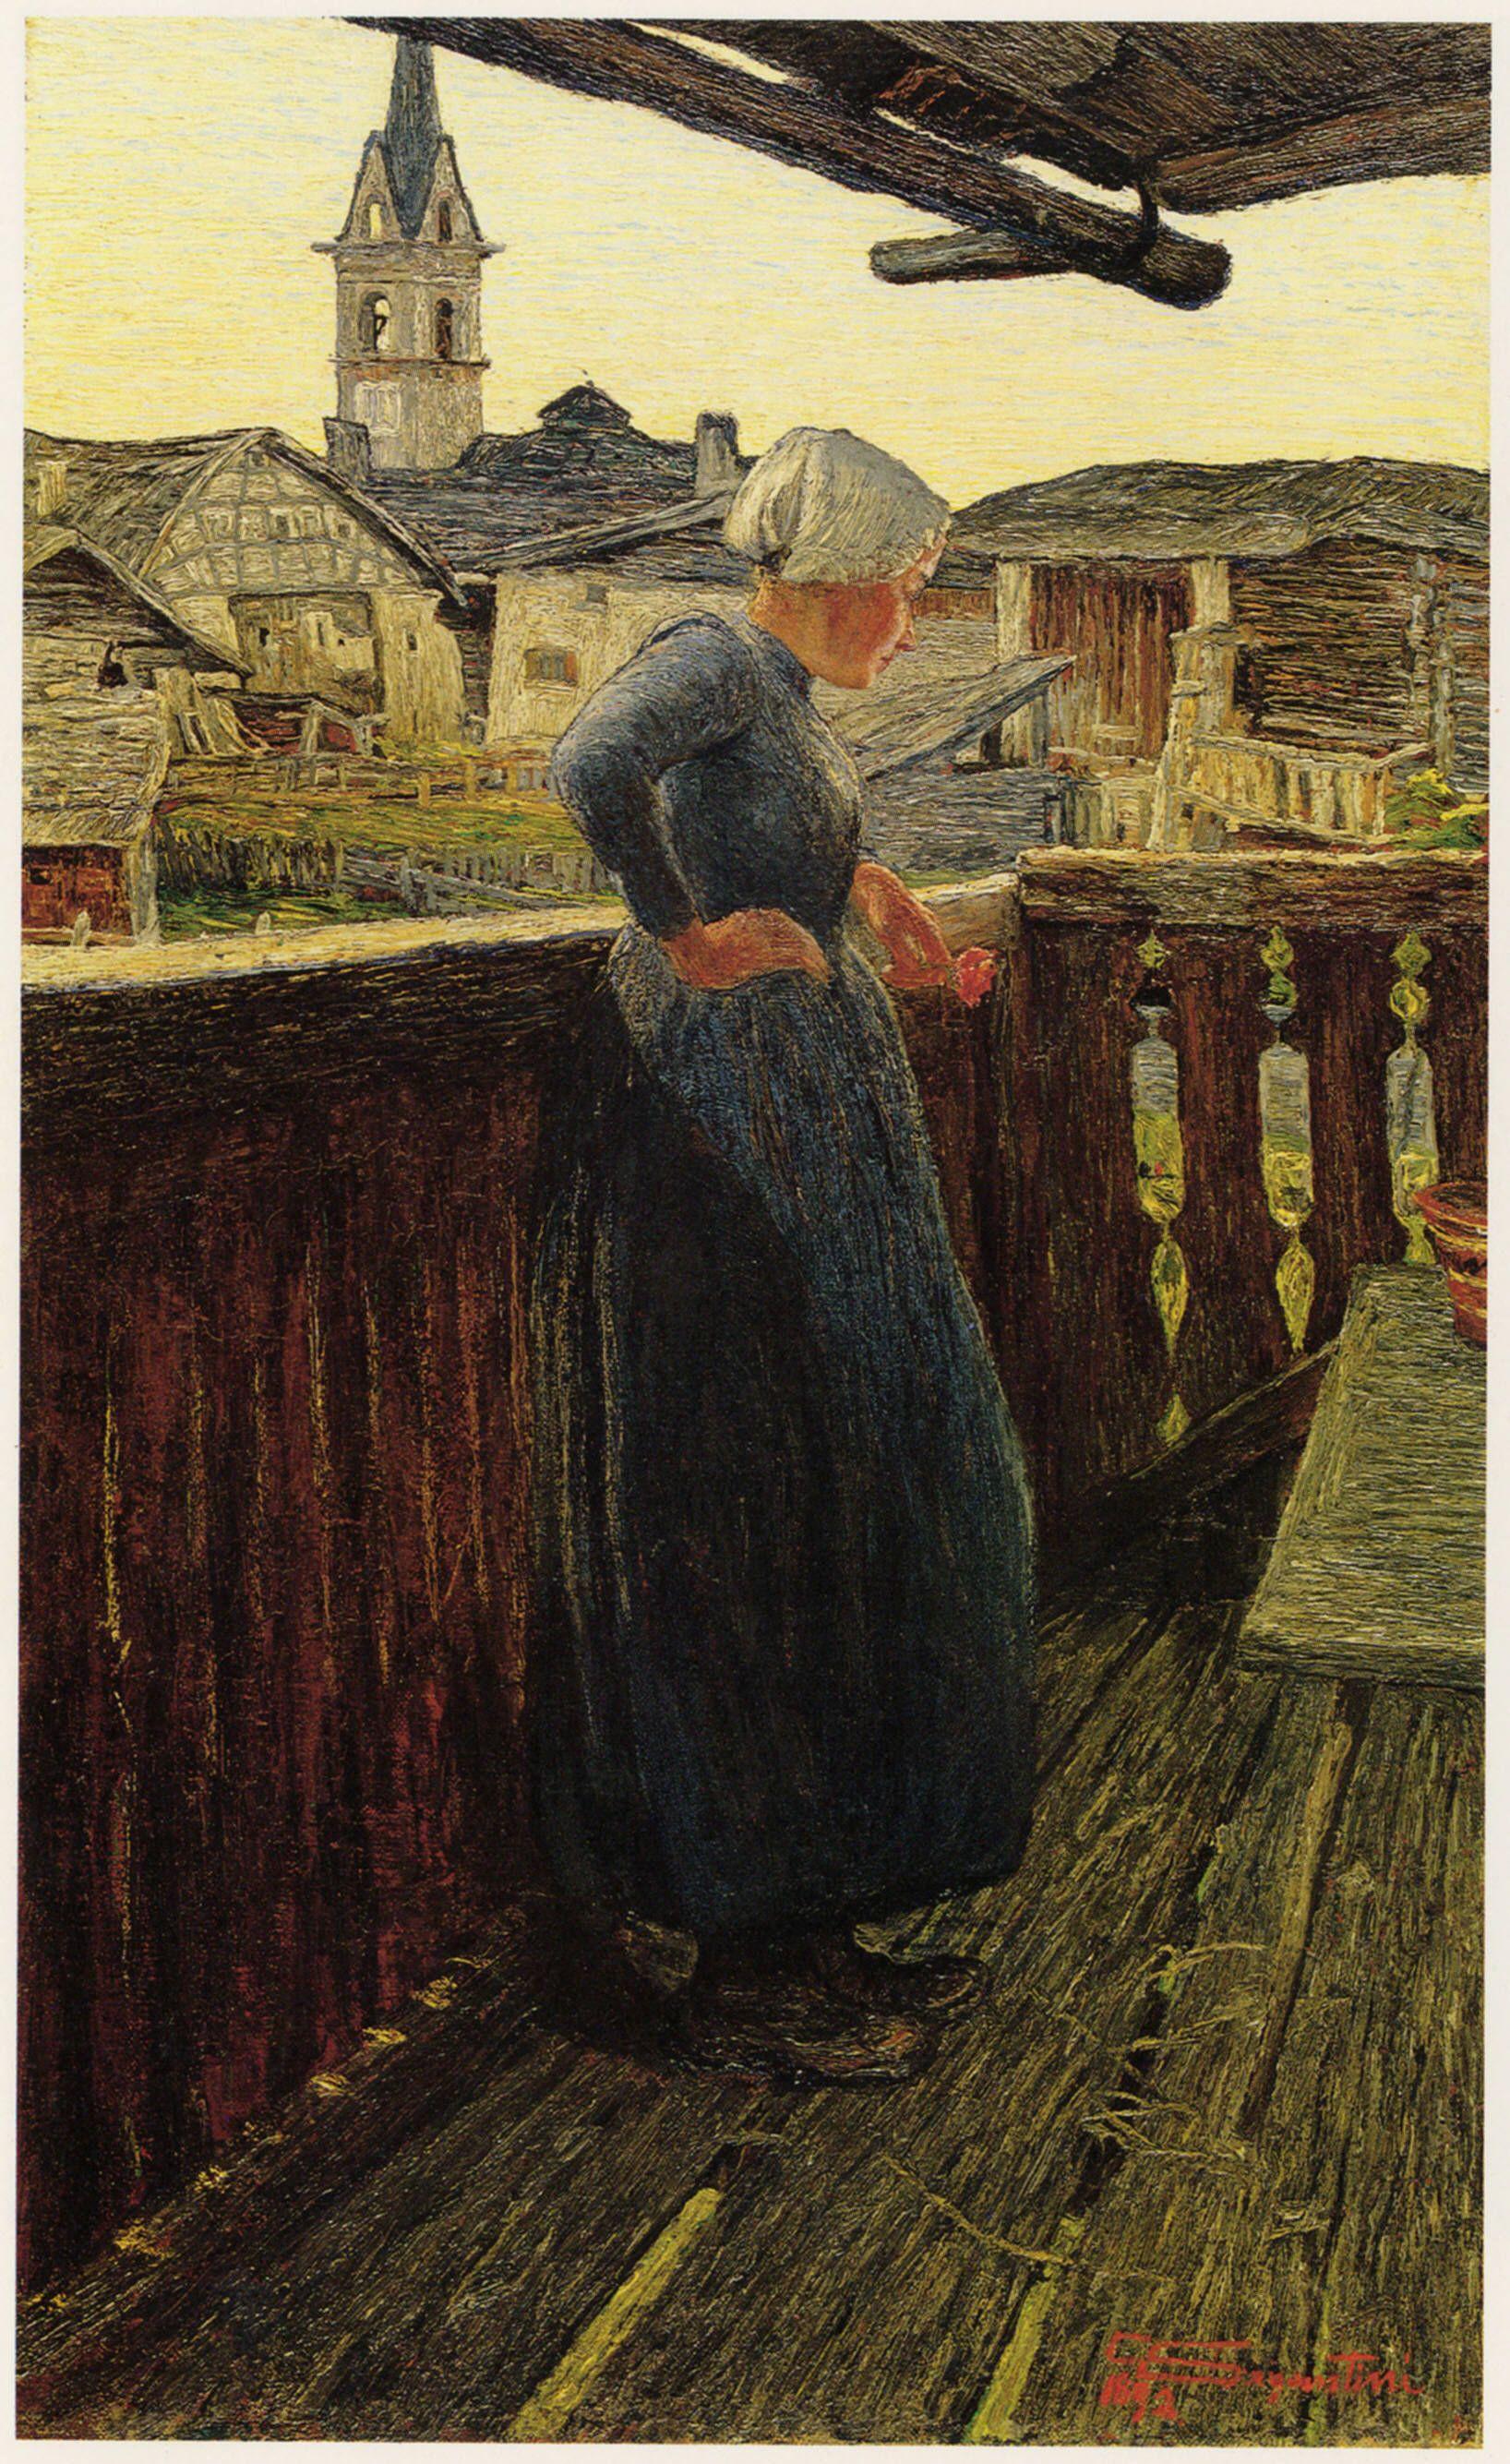 Giovanni Segantini, Al balcone (1893; olio su tela, 66 x 41,5 cm; Coira, Kunsthaus)